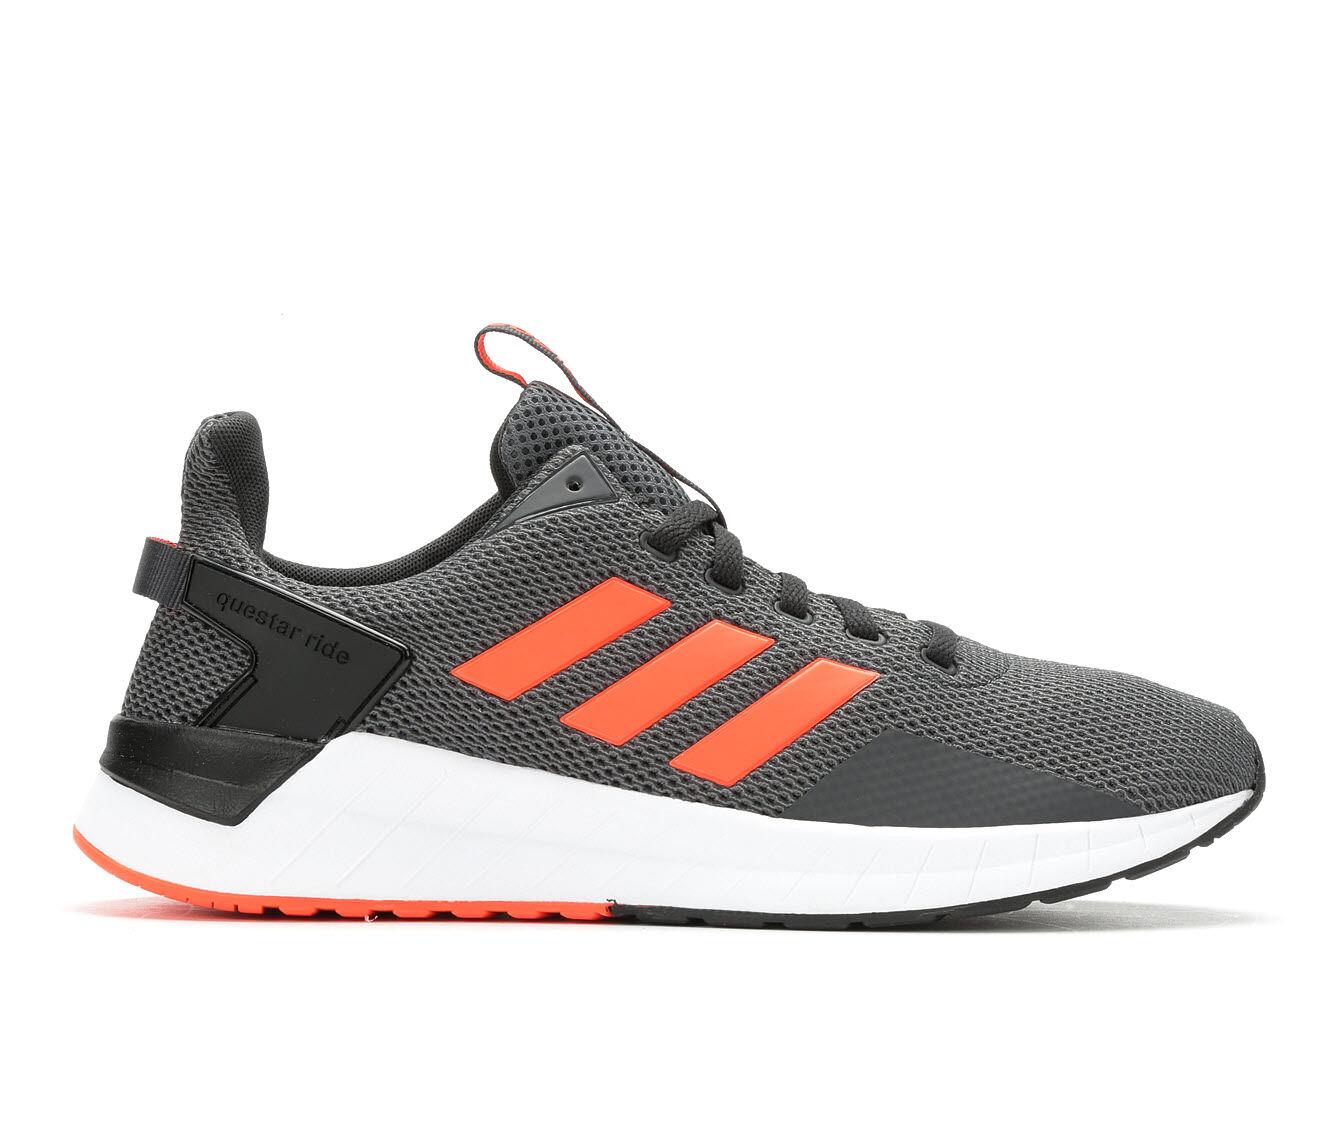 New arrival online Adidas Questar orange white women s shoes US 7 8 8 5 9 5 10 11 12 13